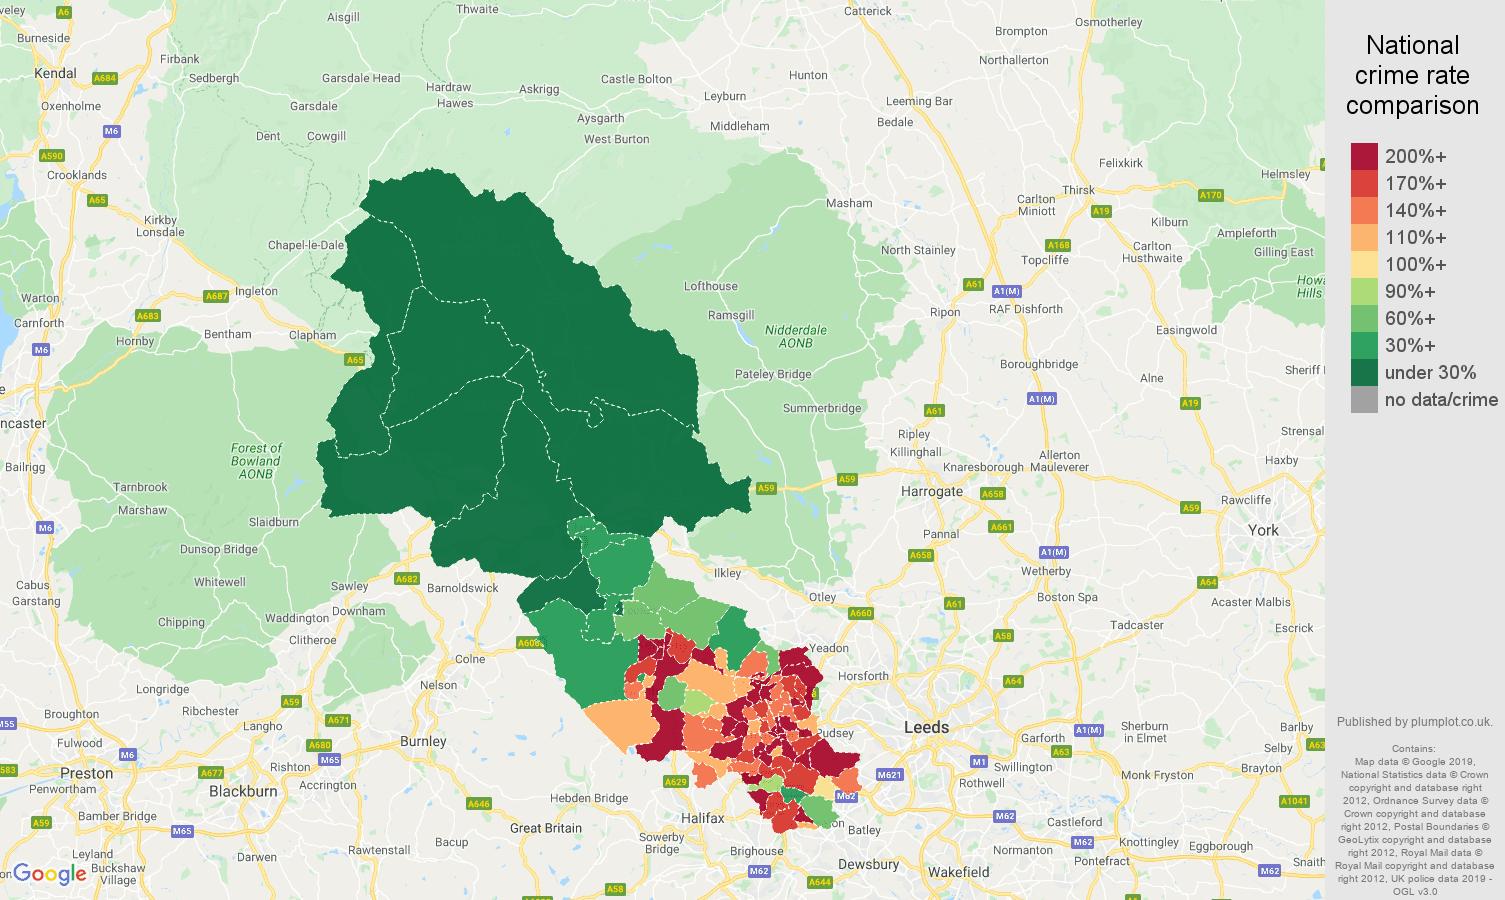 Bradford public order crime rate comparison map